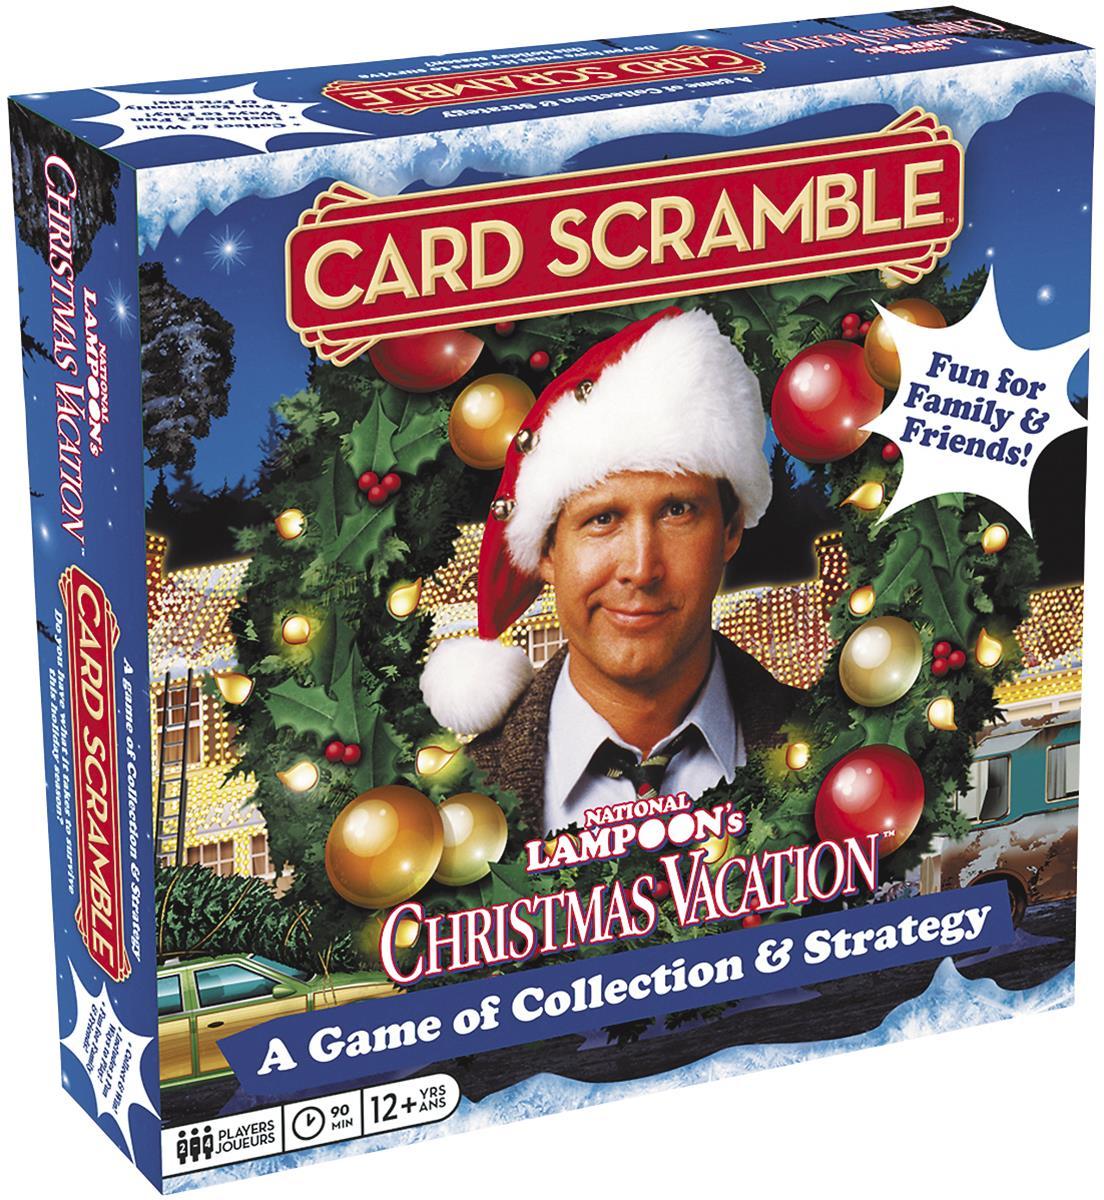 National Lampoo Christmas Vacation.National Lampoon S Christmas Vacation Card Scramble Board Game 97502